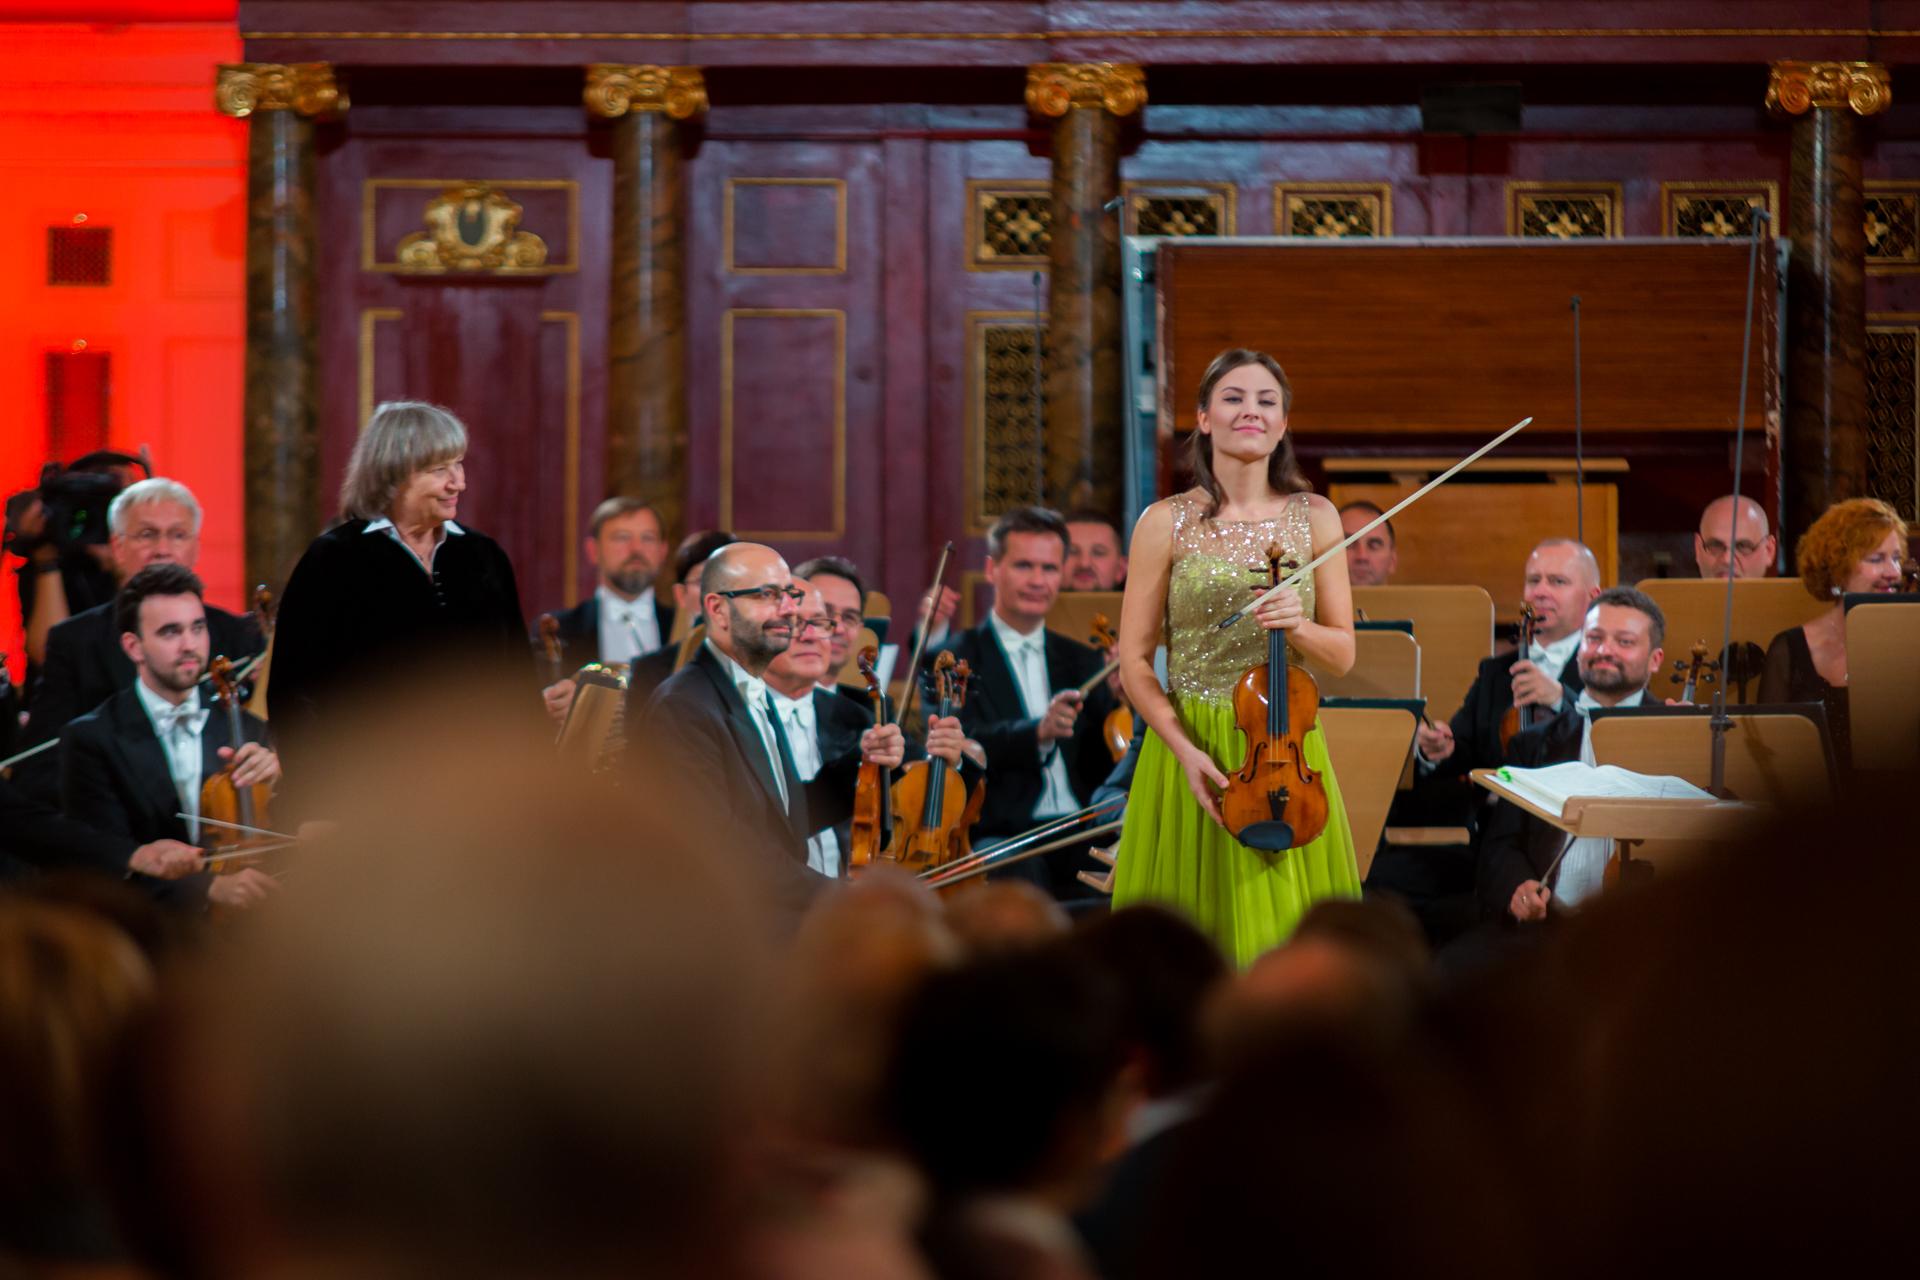 Celina Kotz (Poland) - Stage 3 - 15th International H. Wieniawski Violin Competition BINAURAL | use headphones